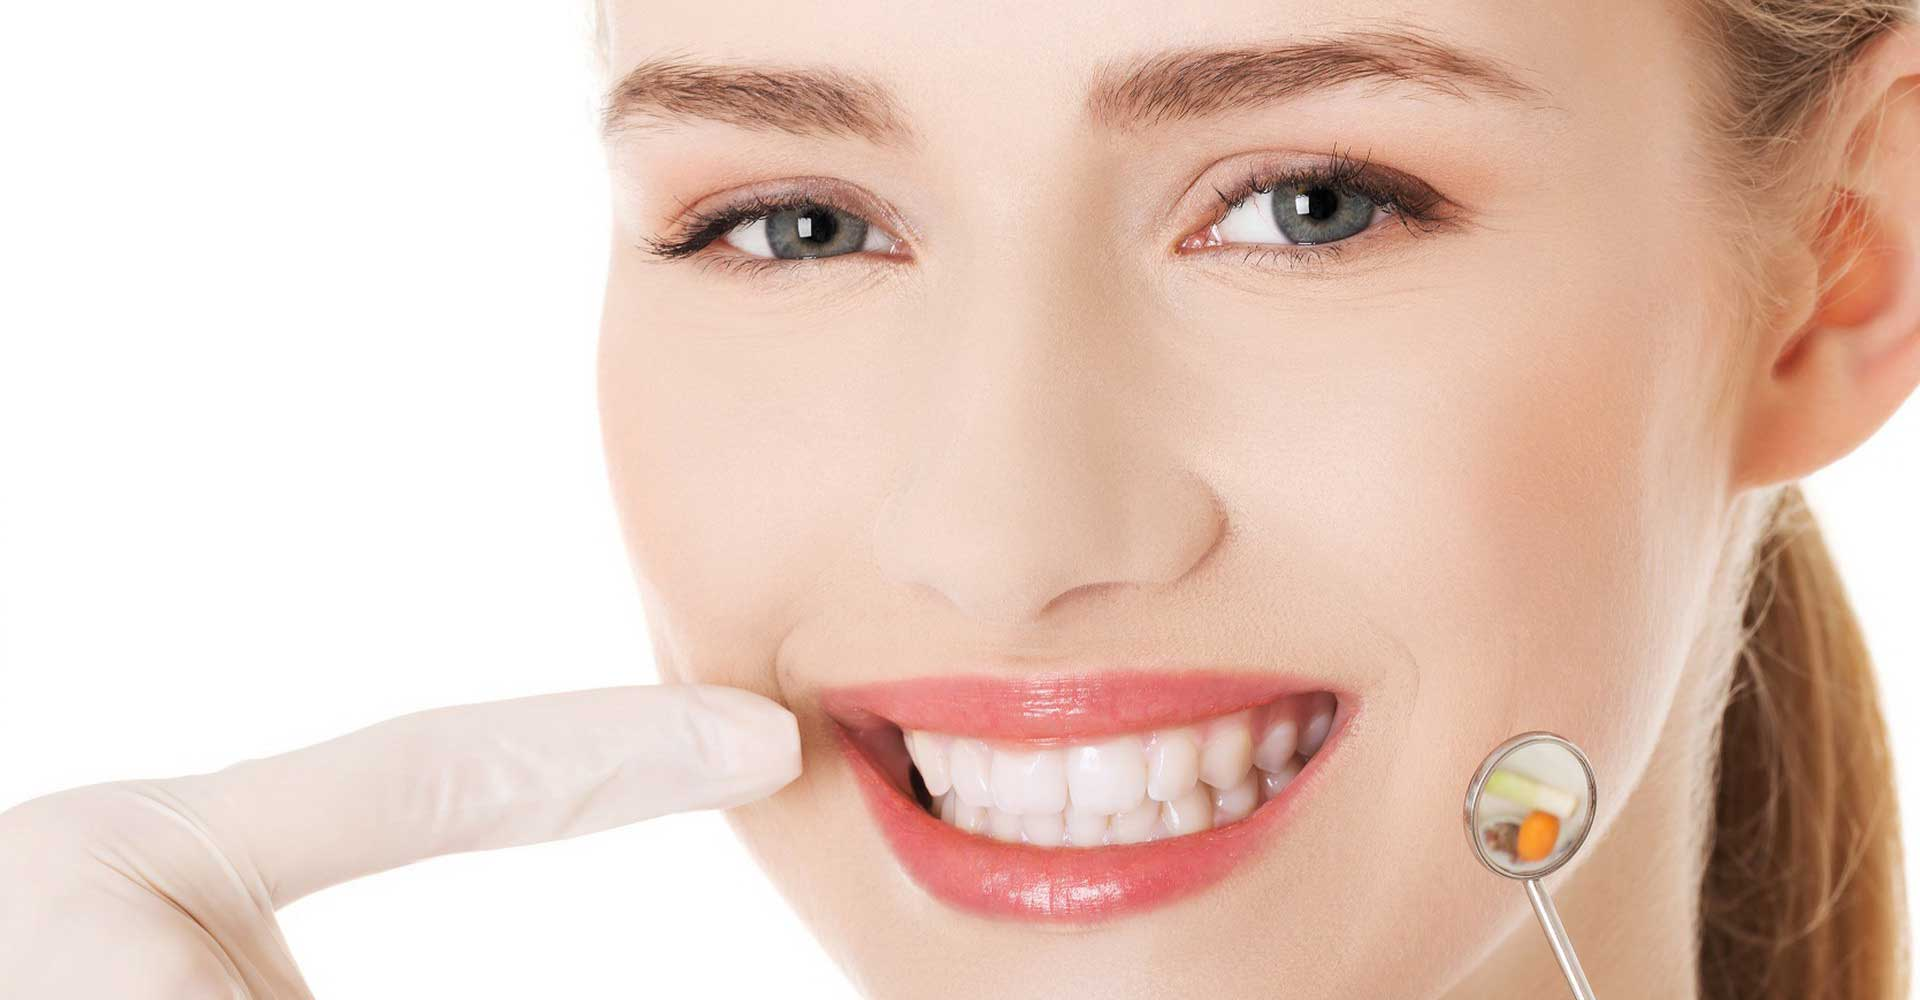 Odontoiatra Ferrara Dentista Ferrara Studio Odontoiatrico Dott. Nicola Mobilio Servizi Richiamo Annuale Igiene Dentale